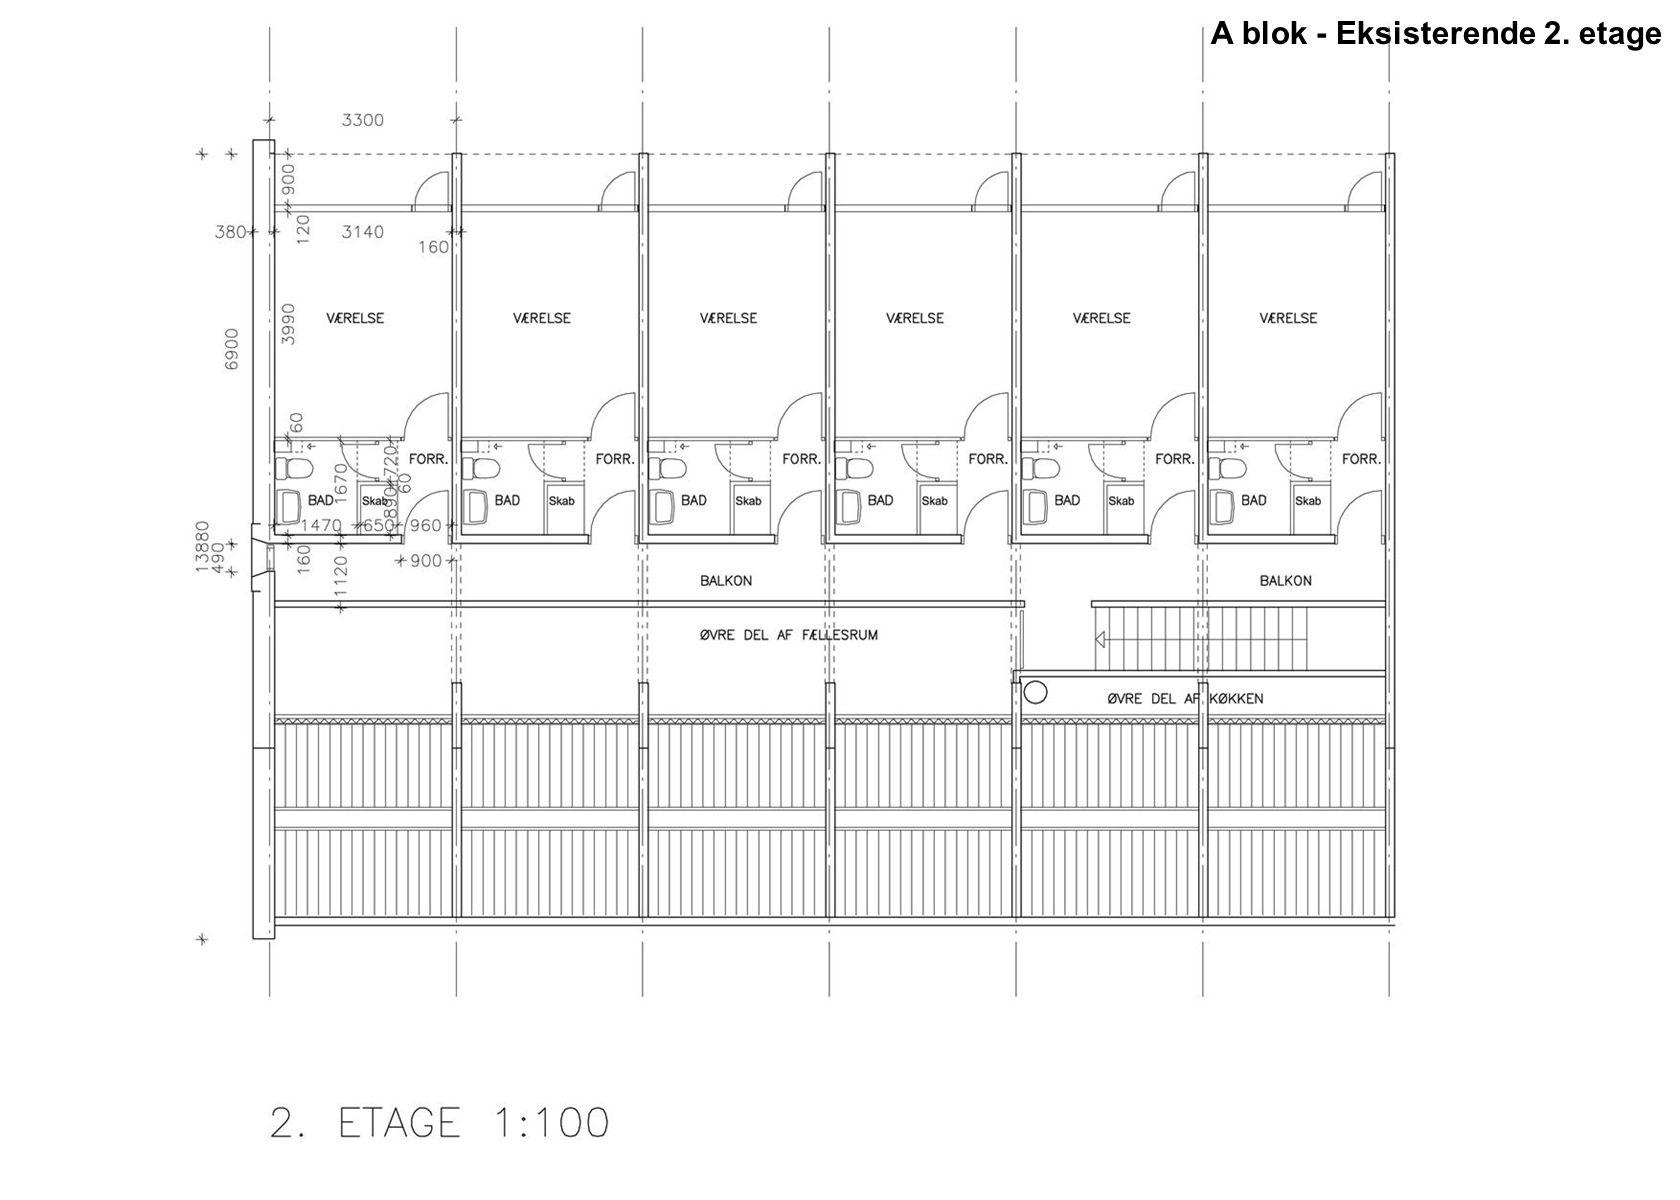 A blok - Eksisterende 2. etage